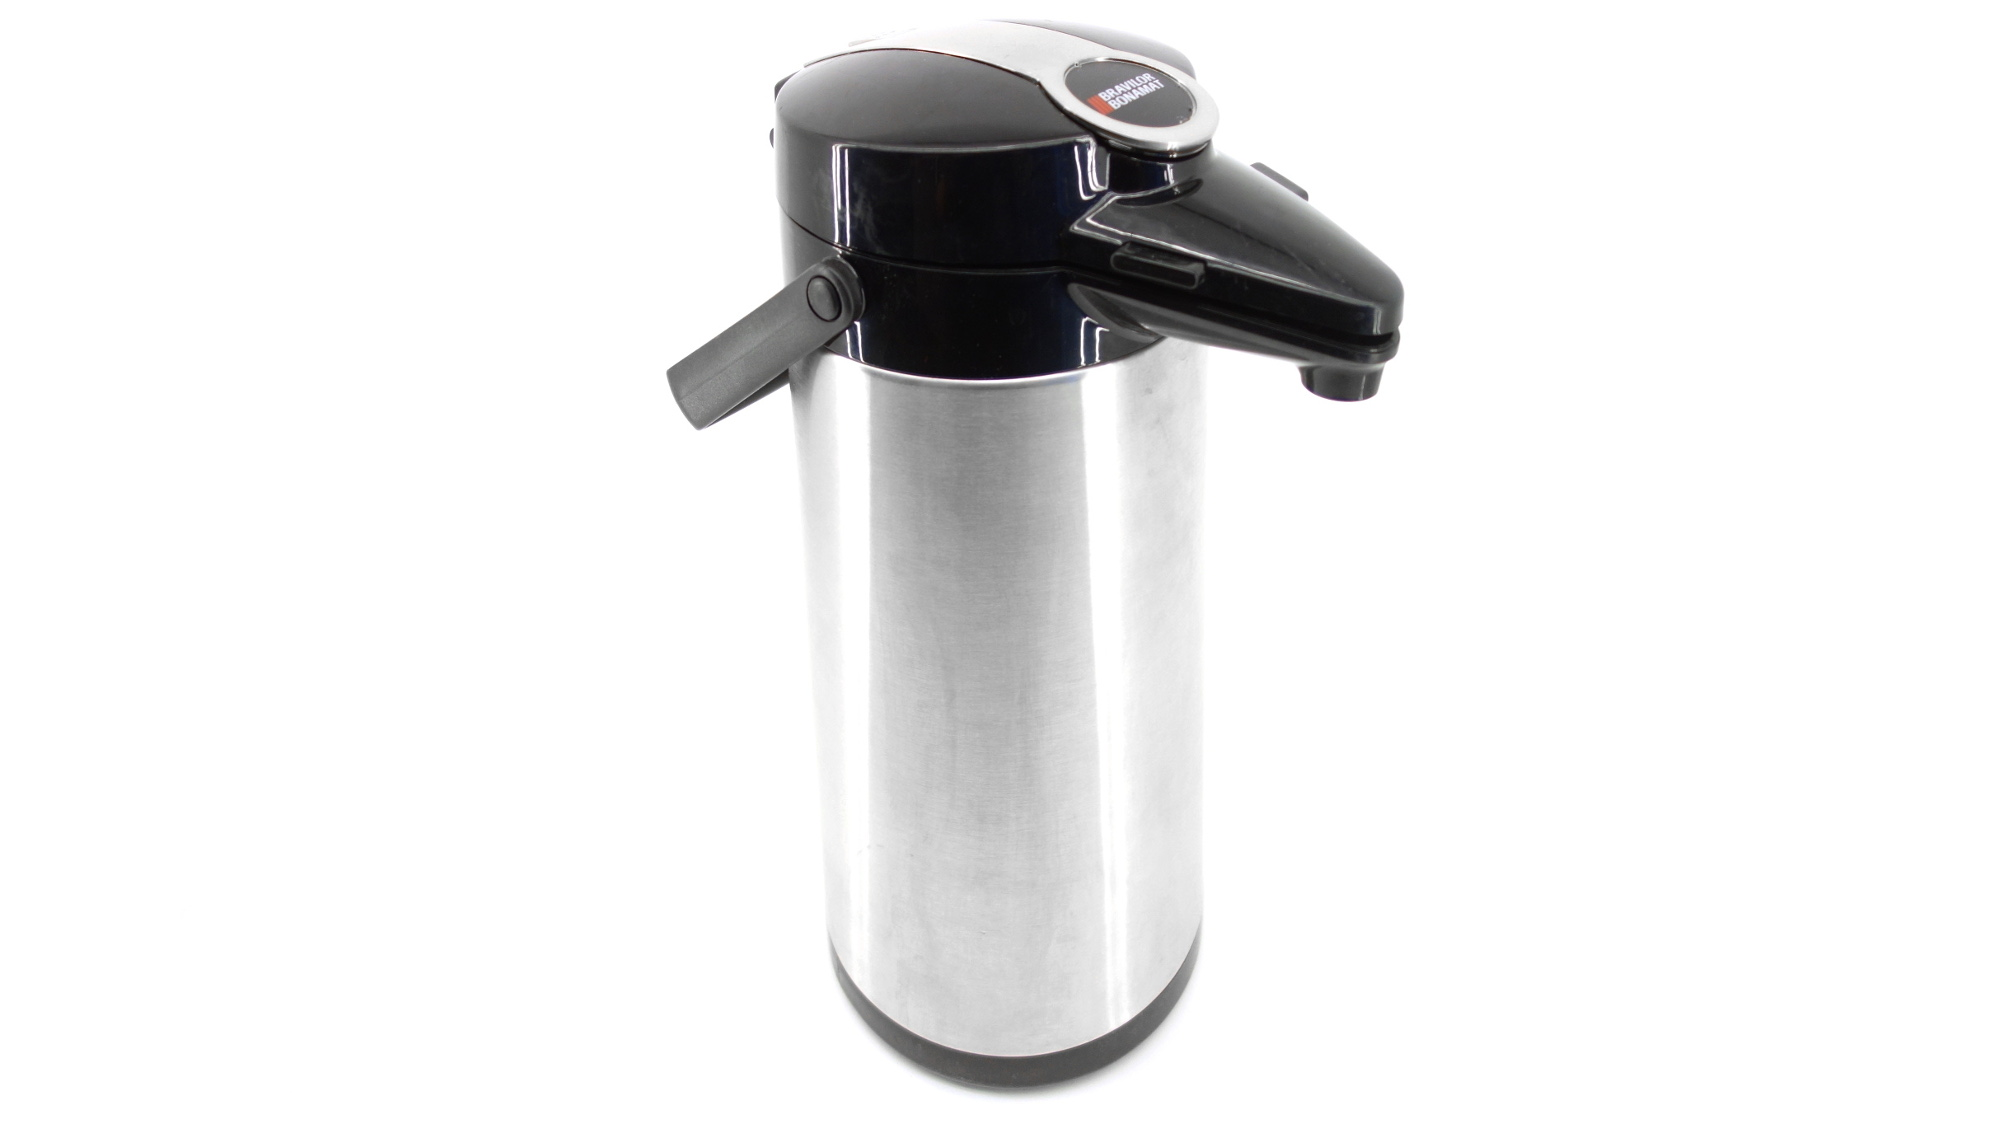 2,2 Liter Kaffeekanne leihen